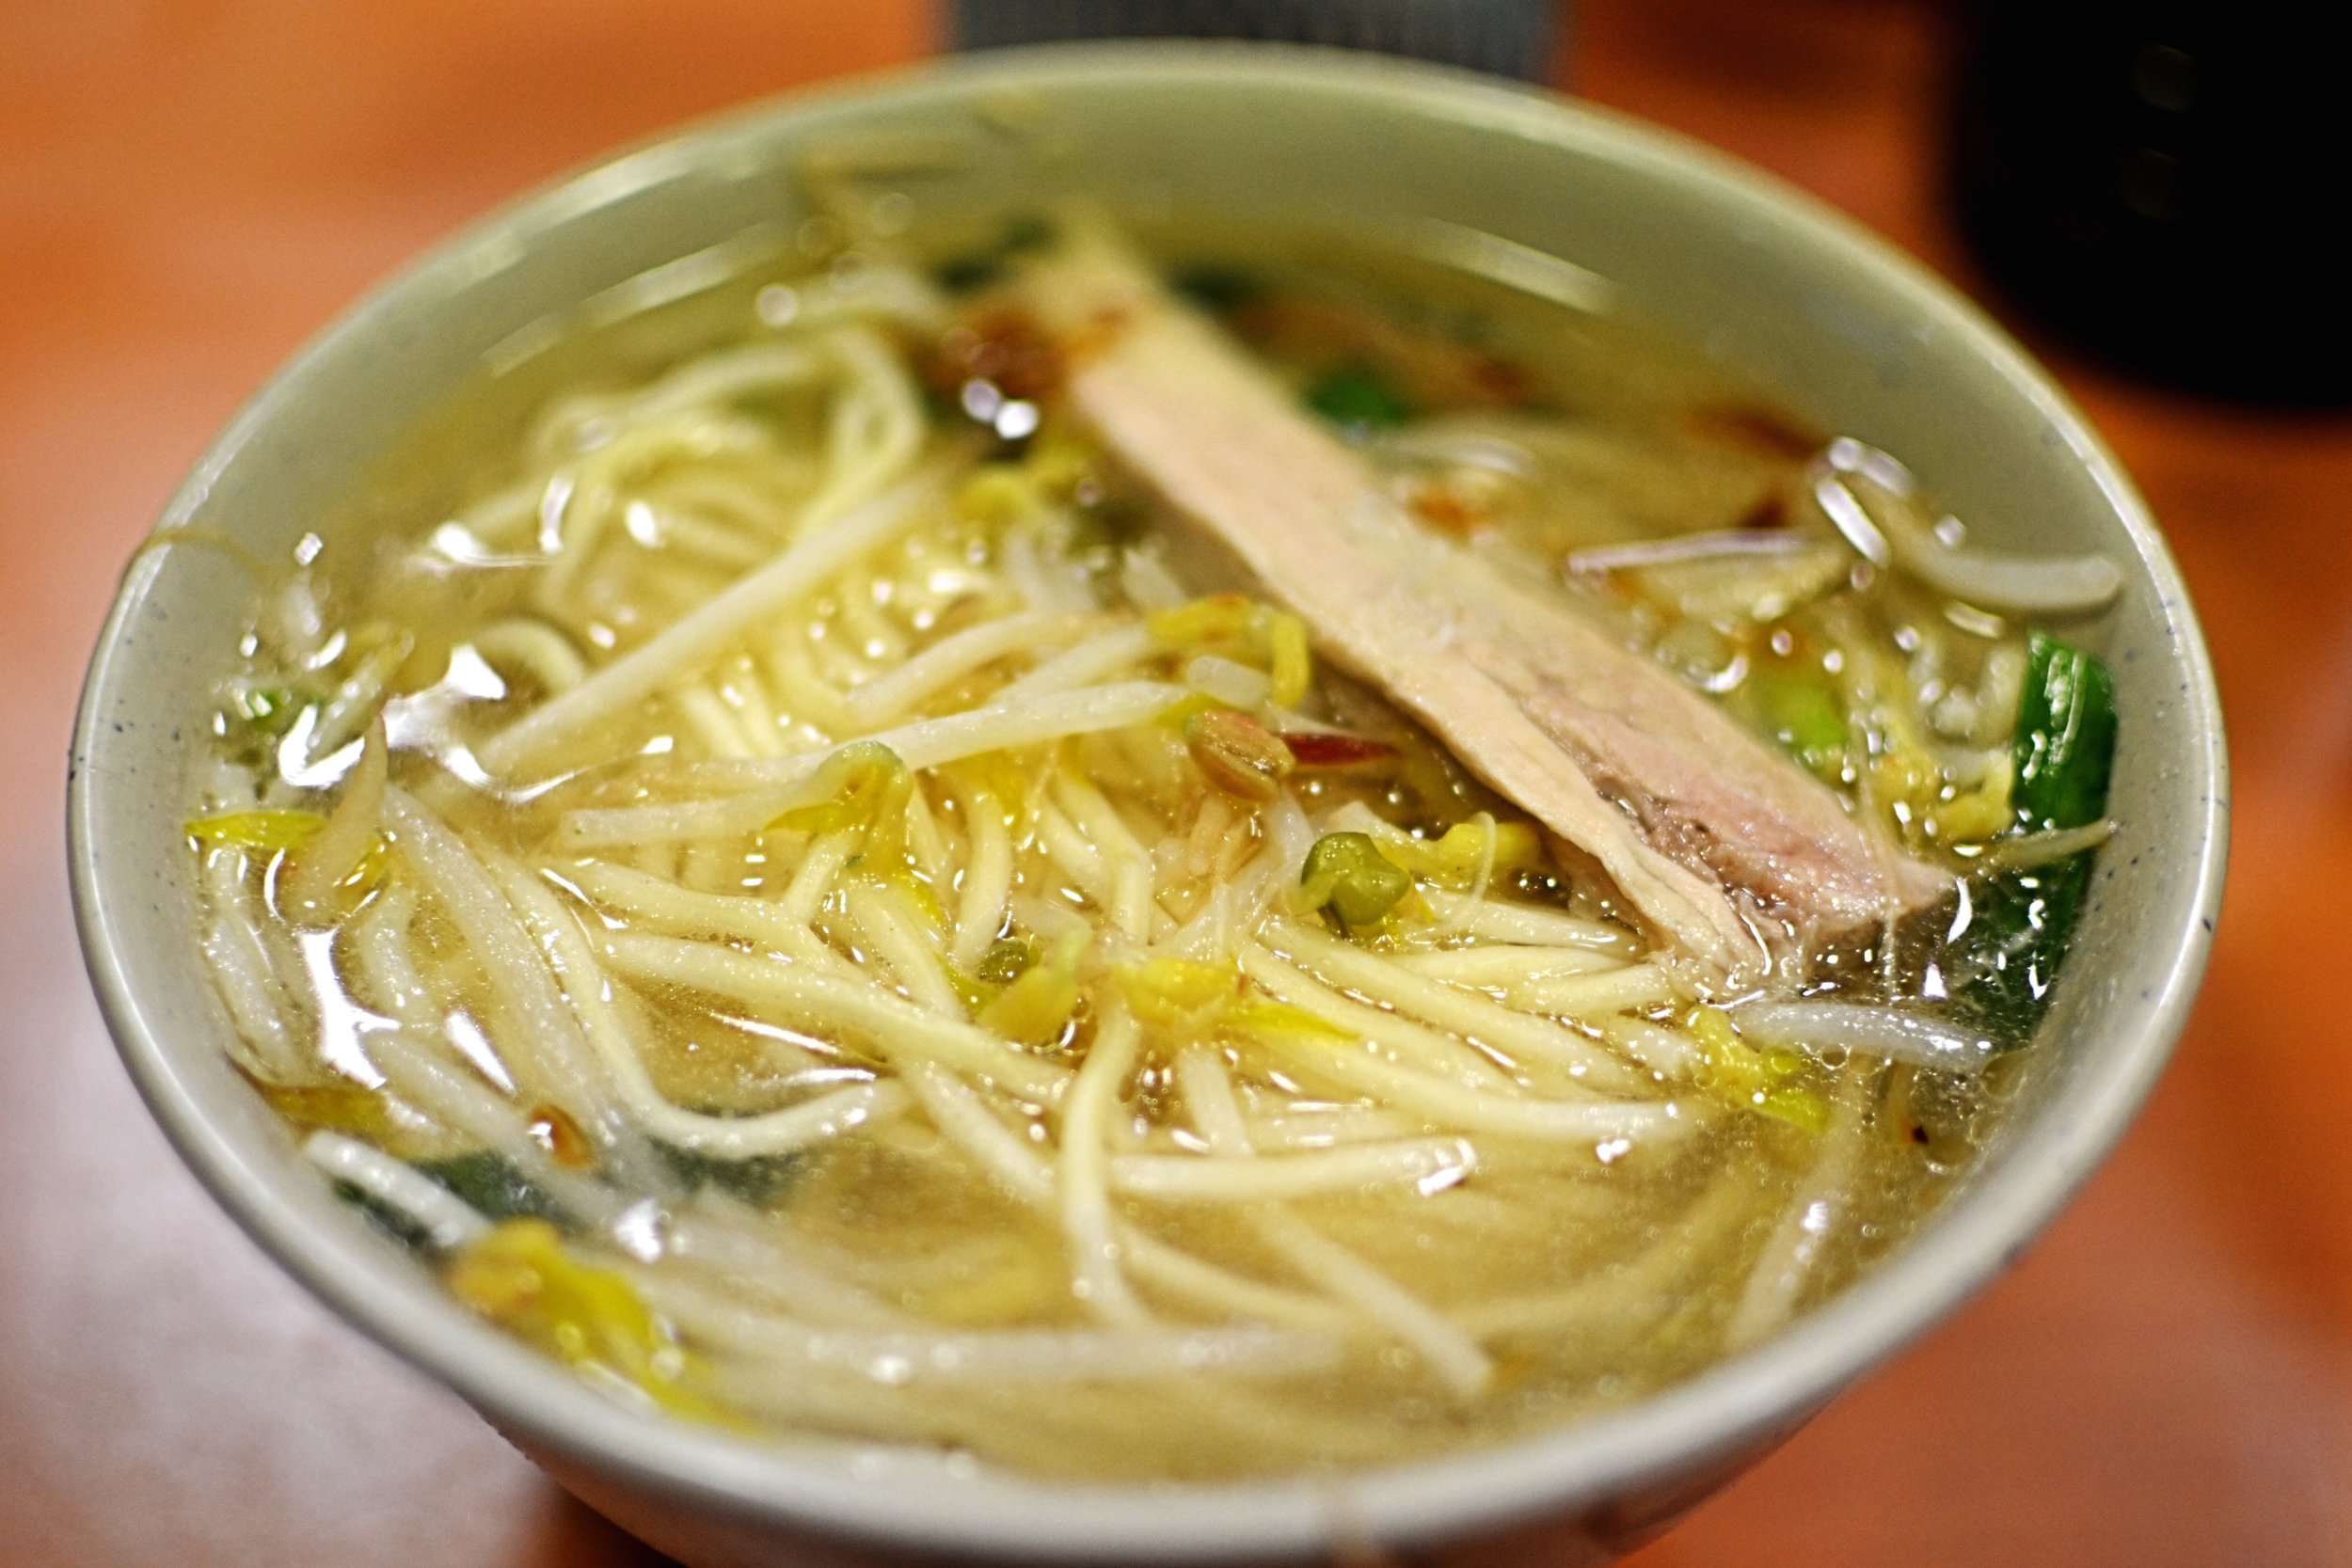 taipei-food-ximentown-noodles.jpg